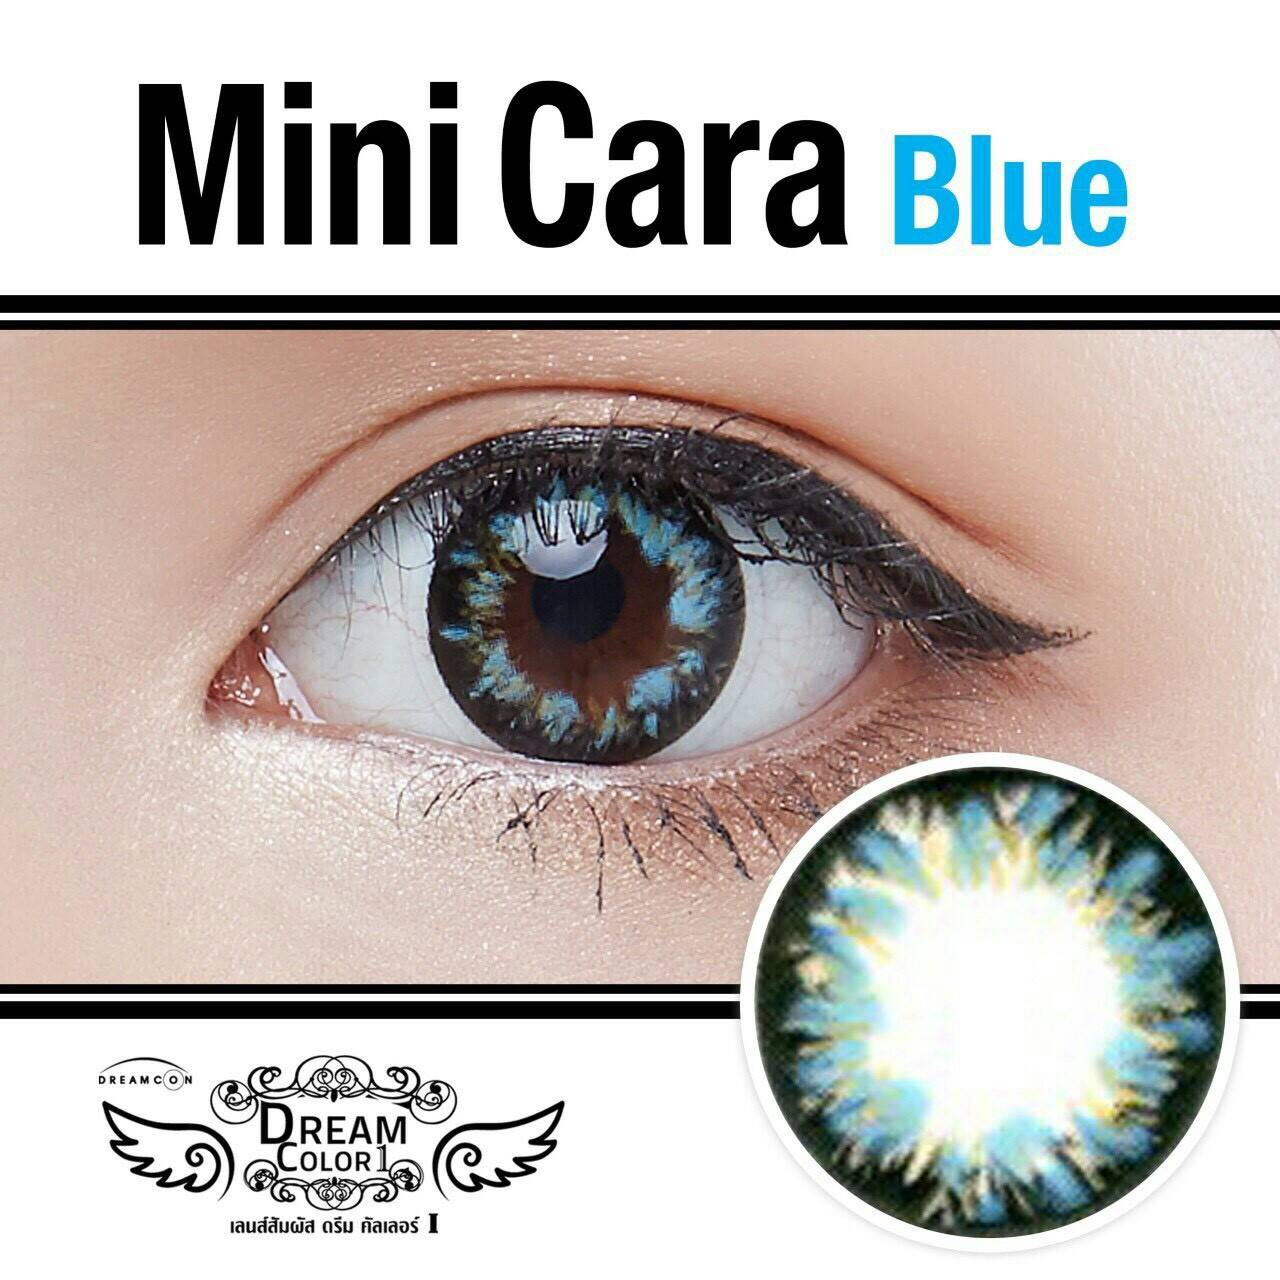 Mini Cara Blue Dreamcolor1เลนส์นิ่มใส่สบาย คอนแทคเลนส์ ขายส่งคอนแทคเลนส์ ขายส่งBigeye Bigeyeเกาหลี